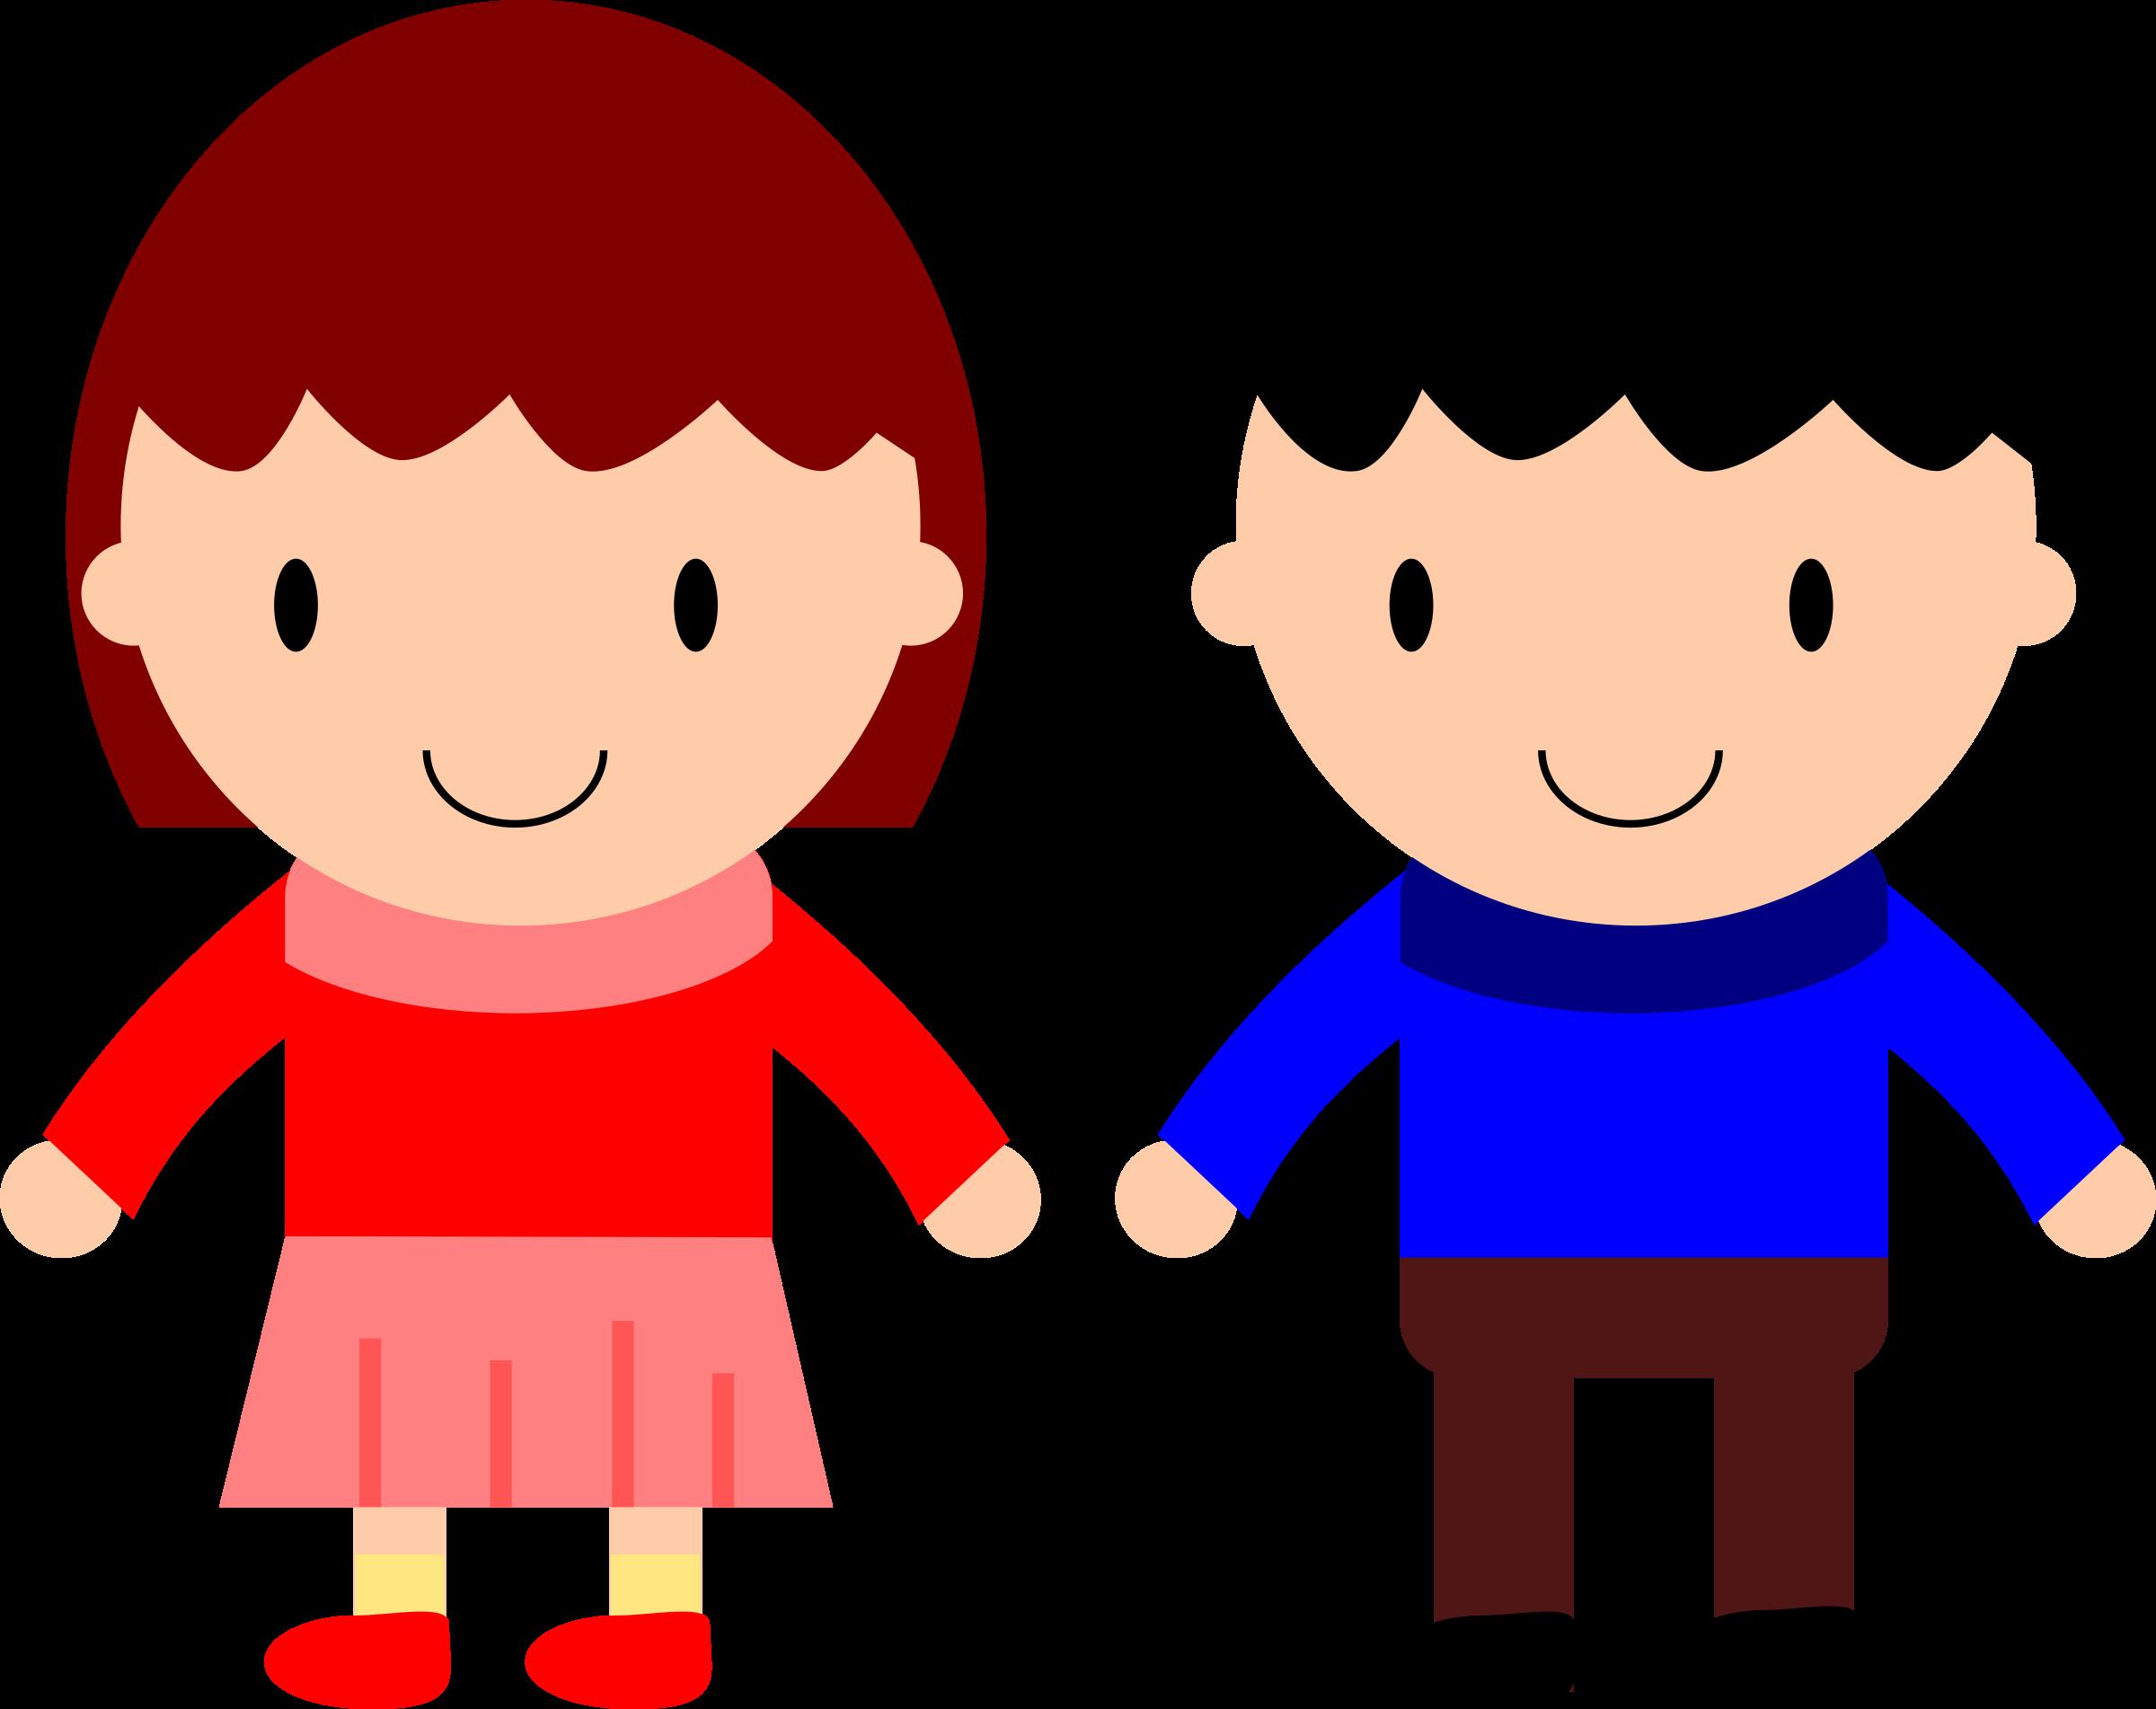 Boy & girl child basketball player clipart picture library stock Clipart - Girl and Boy picture library stock